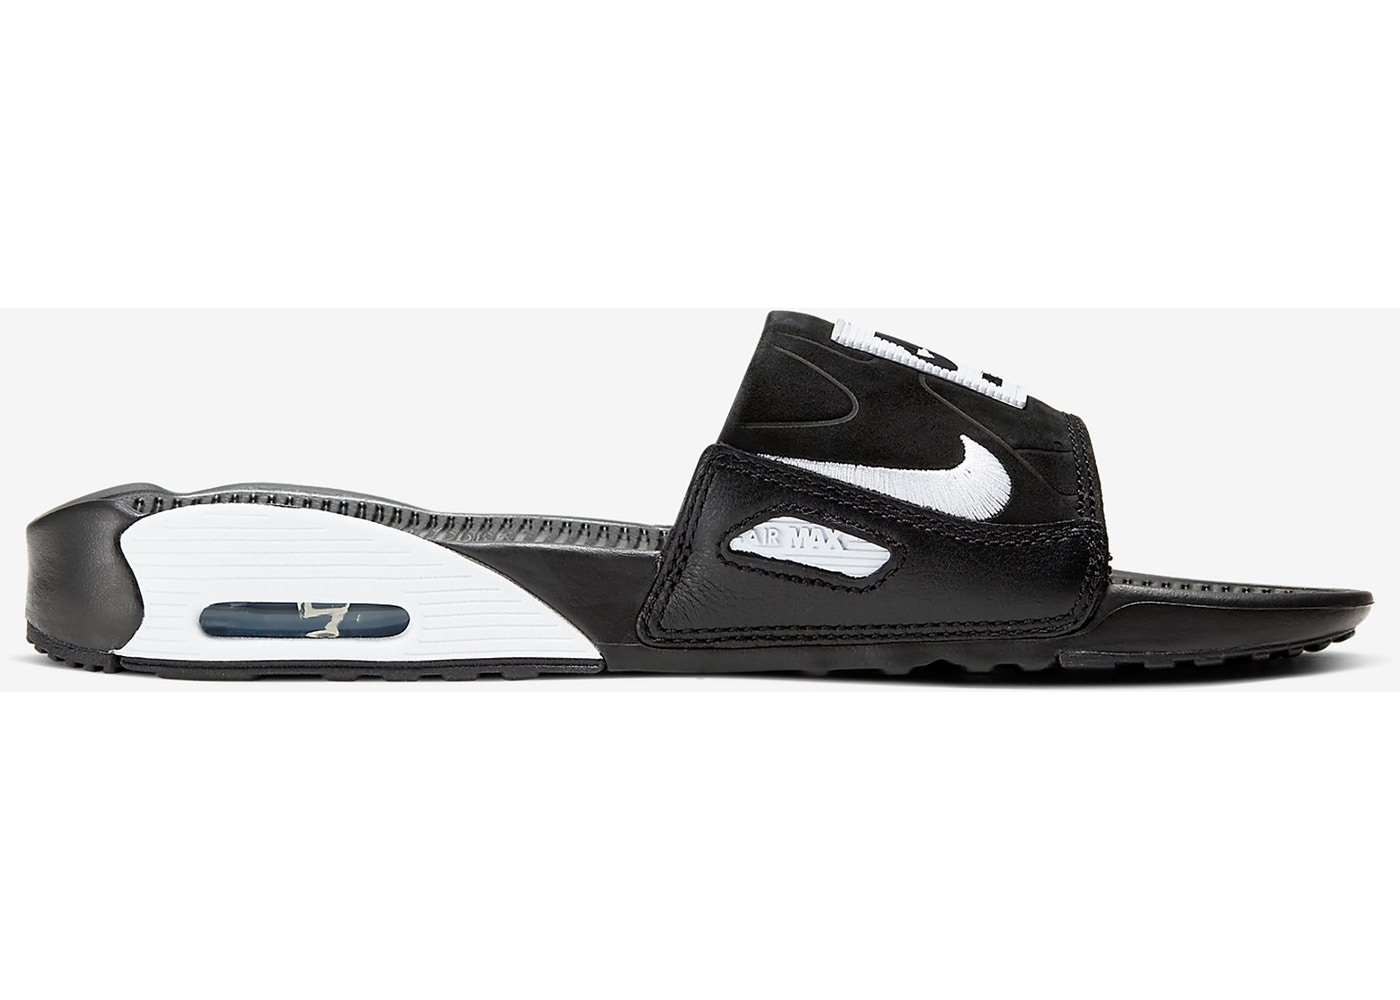 Nike Air Max 90 Slide Black White (W)